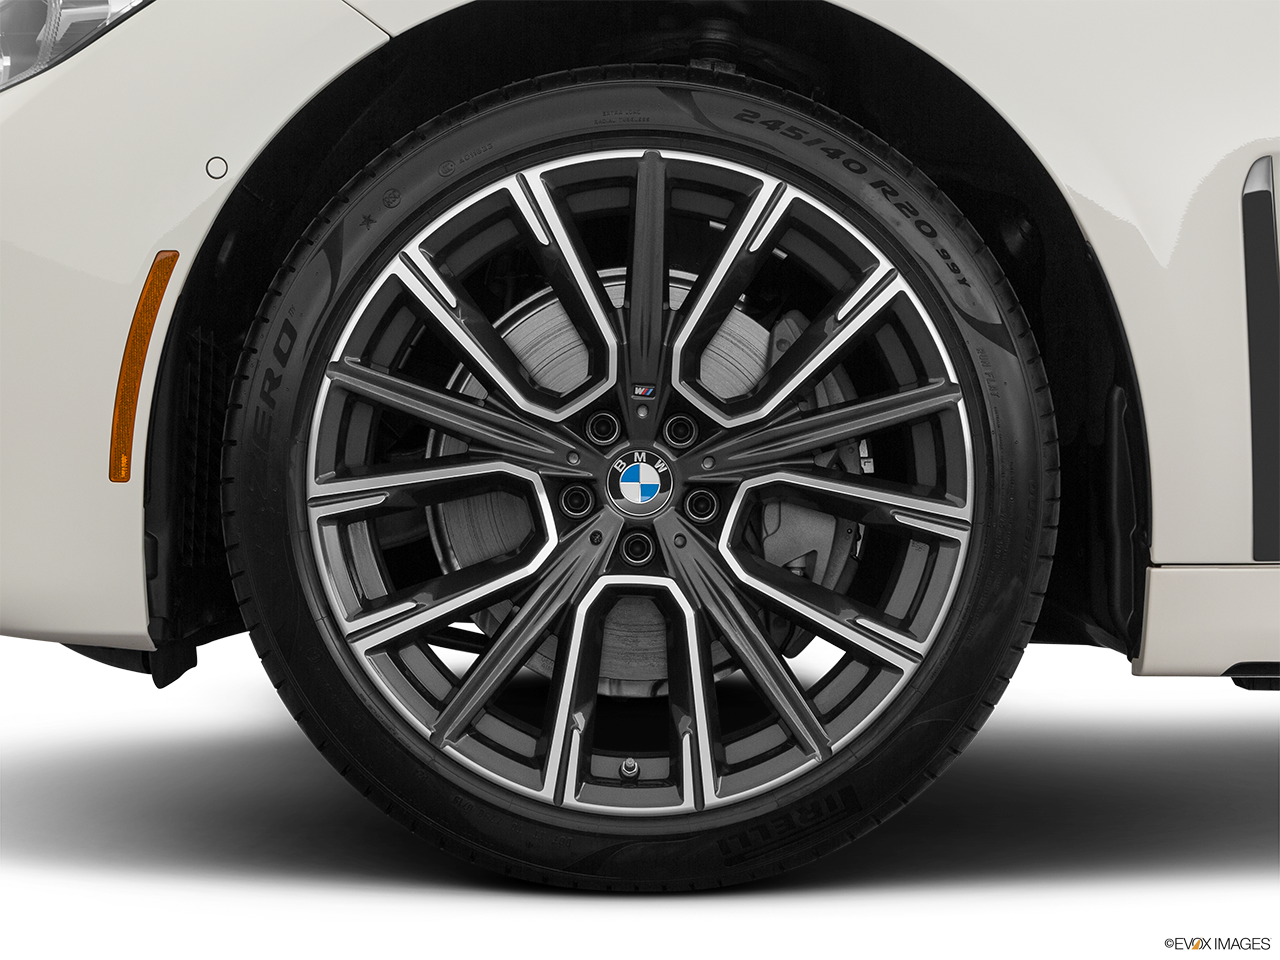 2020 BMW 7 Series photo